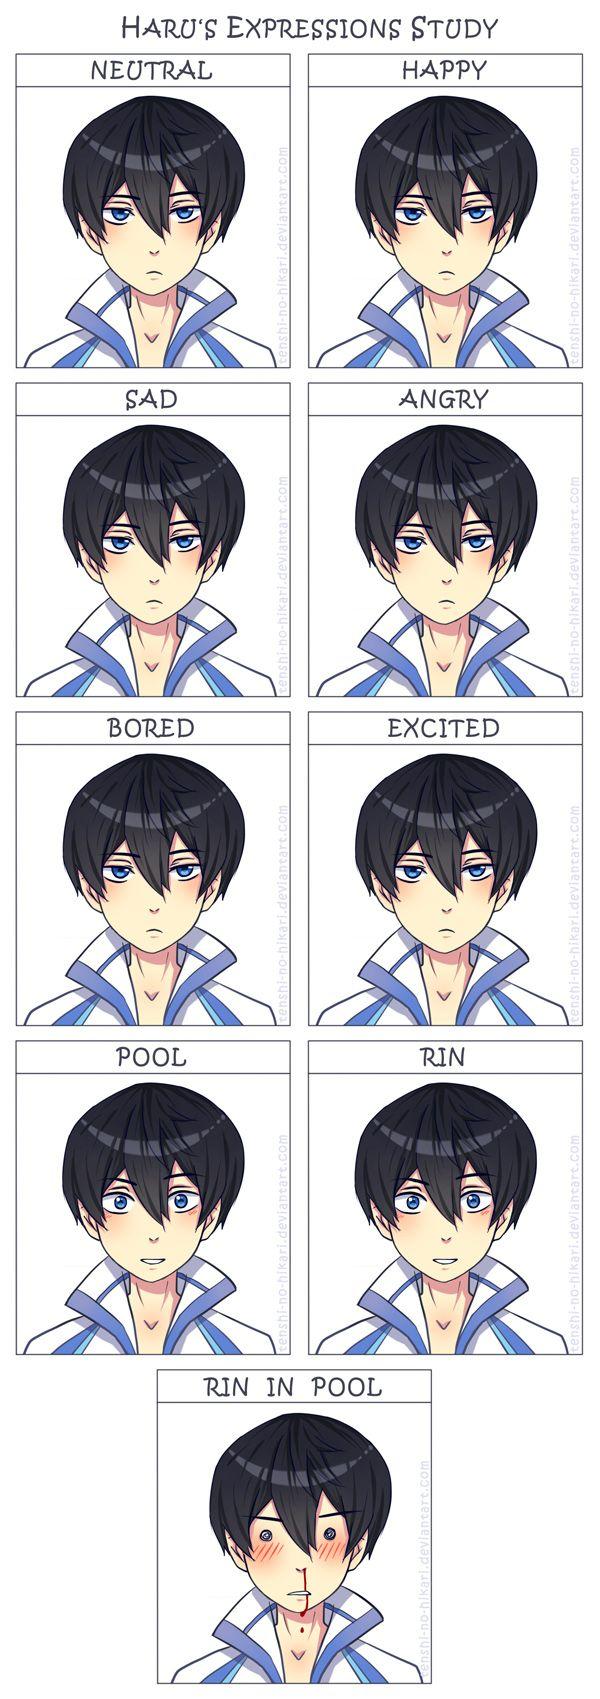 Free - Haru's expressions study by Tenshi-no-Hikari on DeviantArt